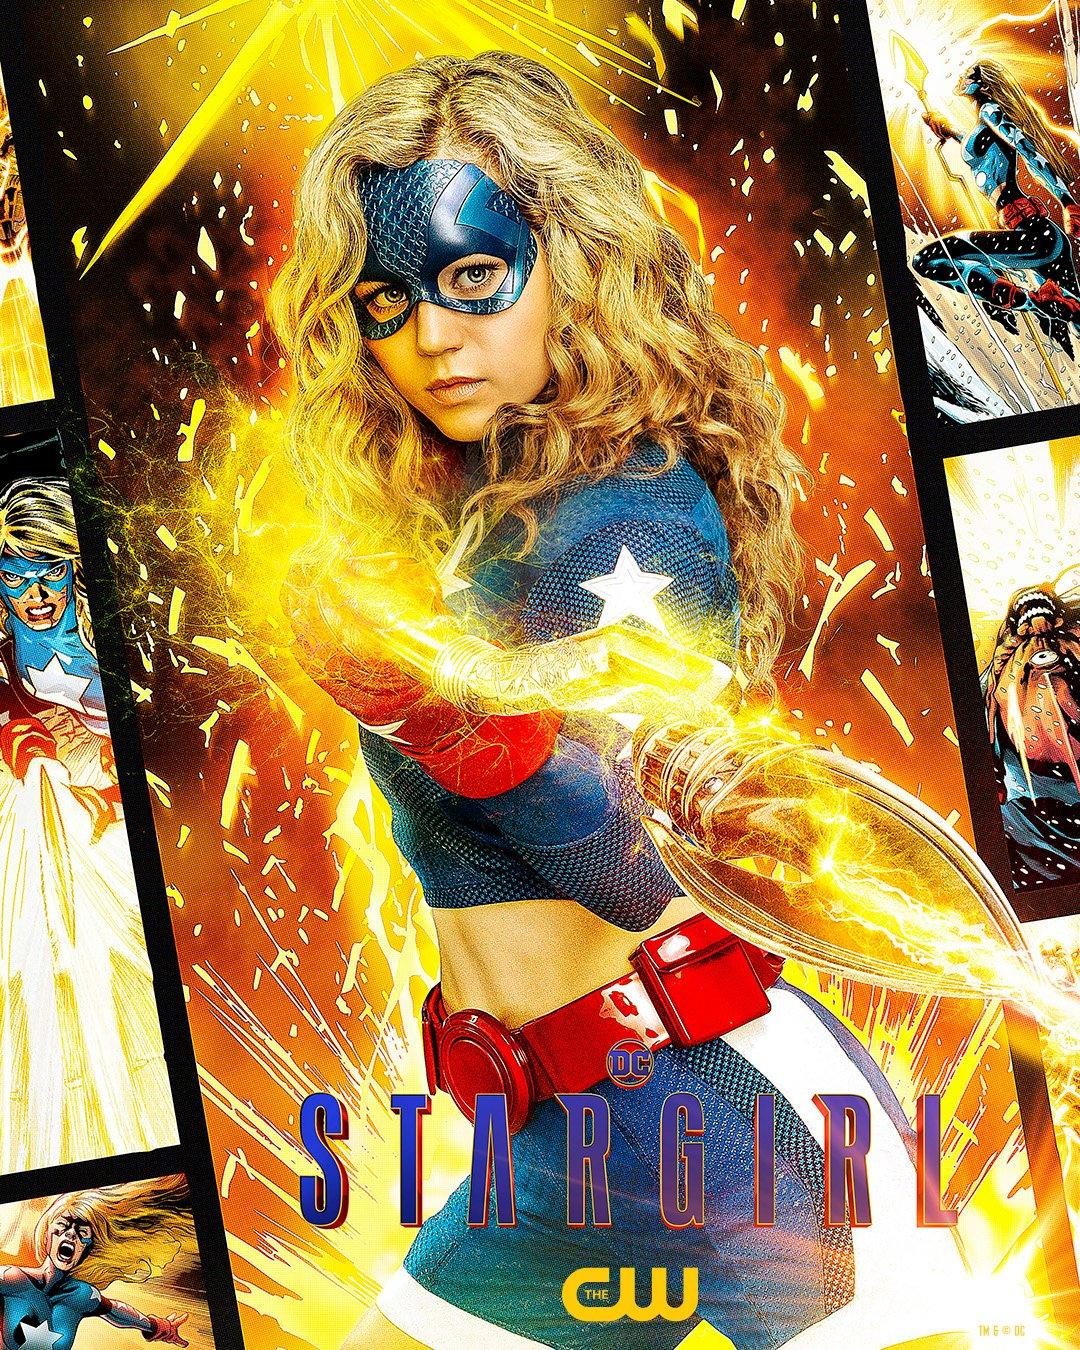 Stargirl (Brec Bassinger) en un póster de Stargirl. Imagen: Stargirl Twitter (@stargirl_cw).